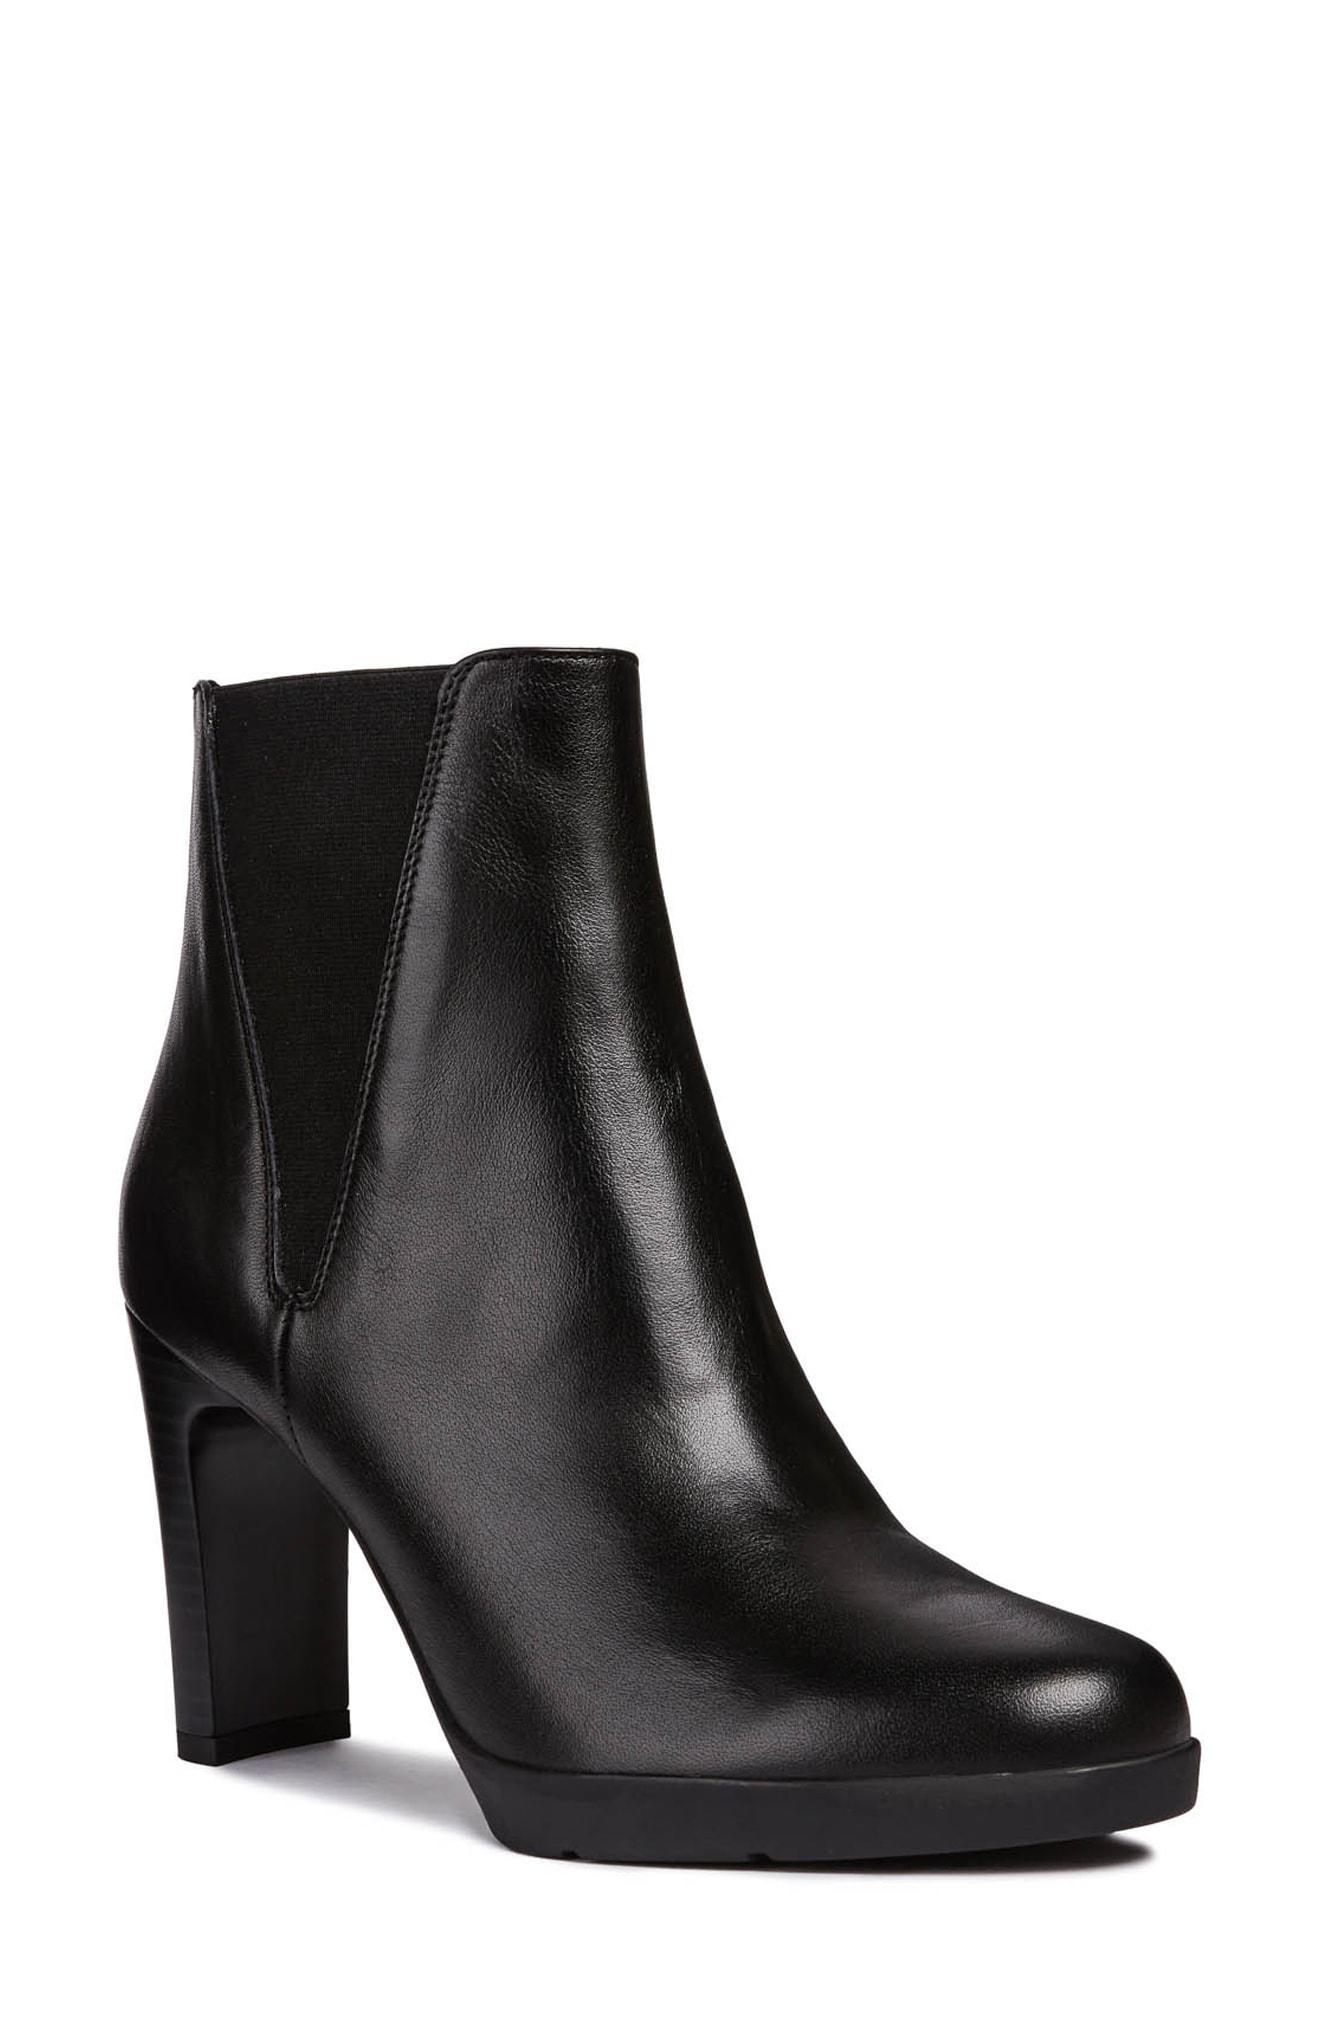 Geox Black Annya High Ankle Boot D84aeh